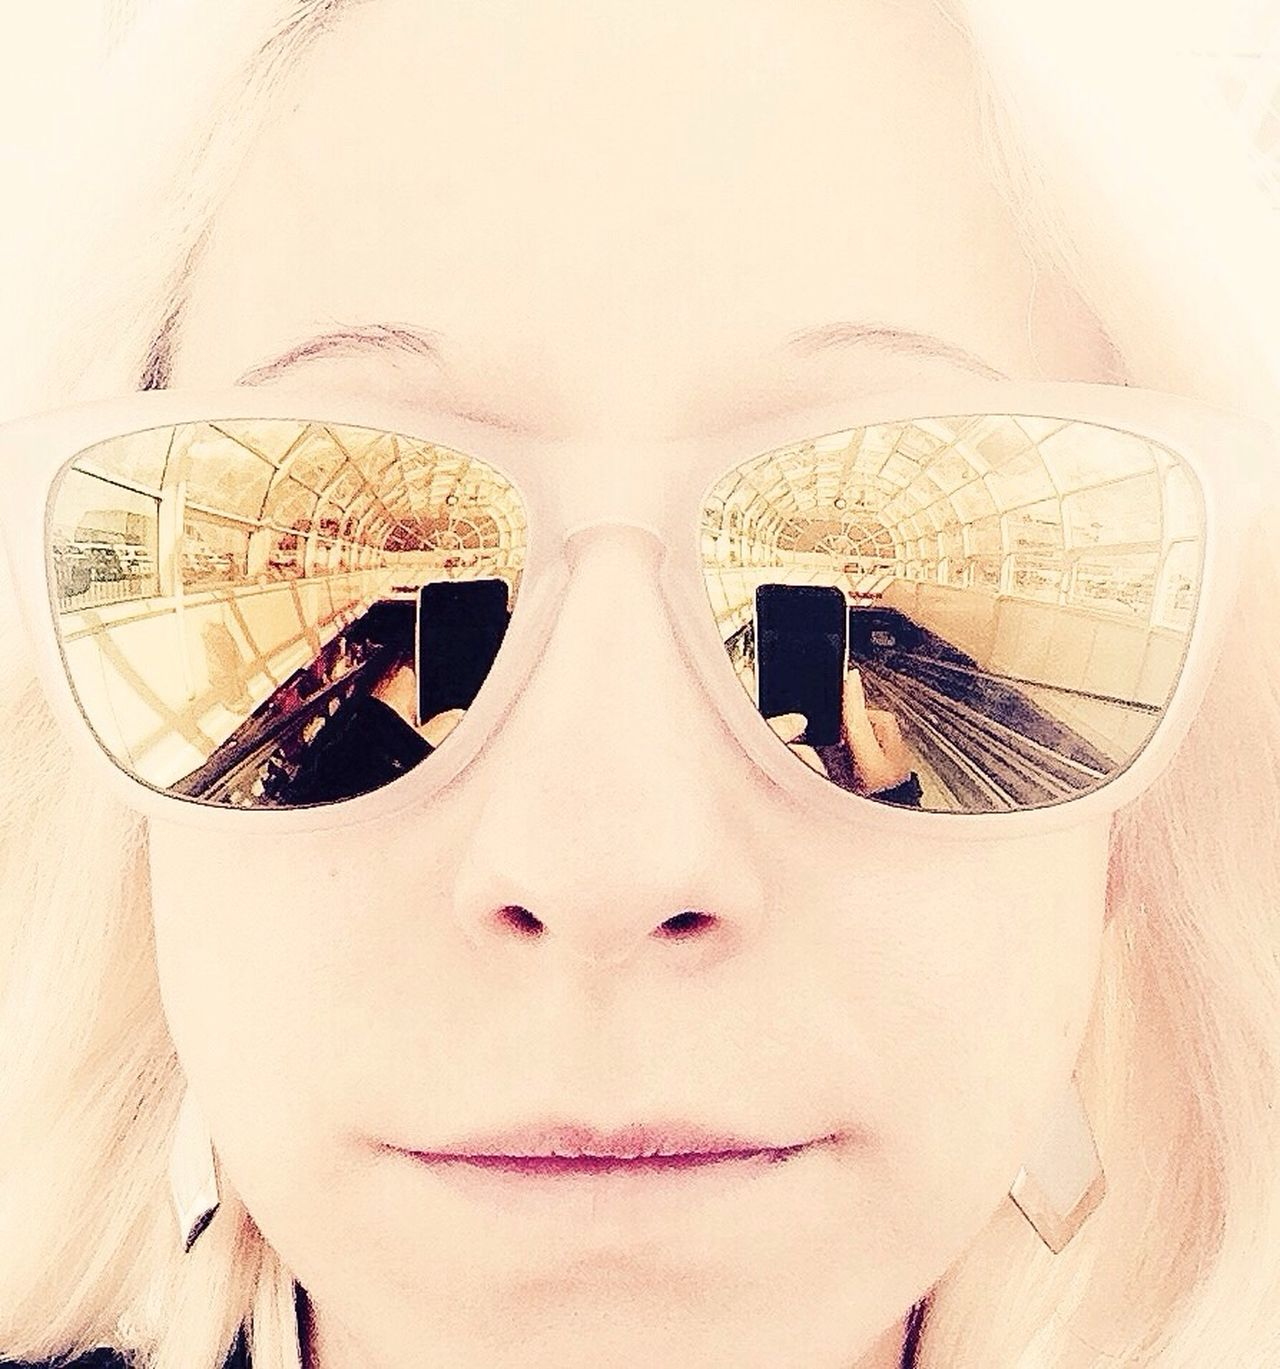 The OO Mission Sunglasses Sunglass  Sunglasses :) Sunglases Sunglasses ✌👌 Sunglasses👓 Sunglasses Reflection